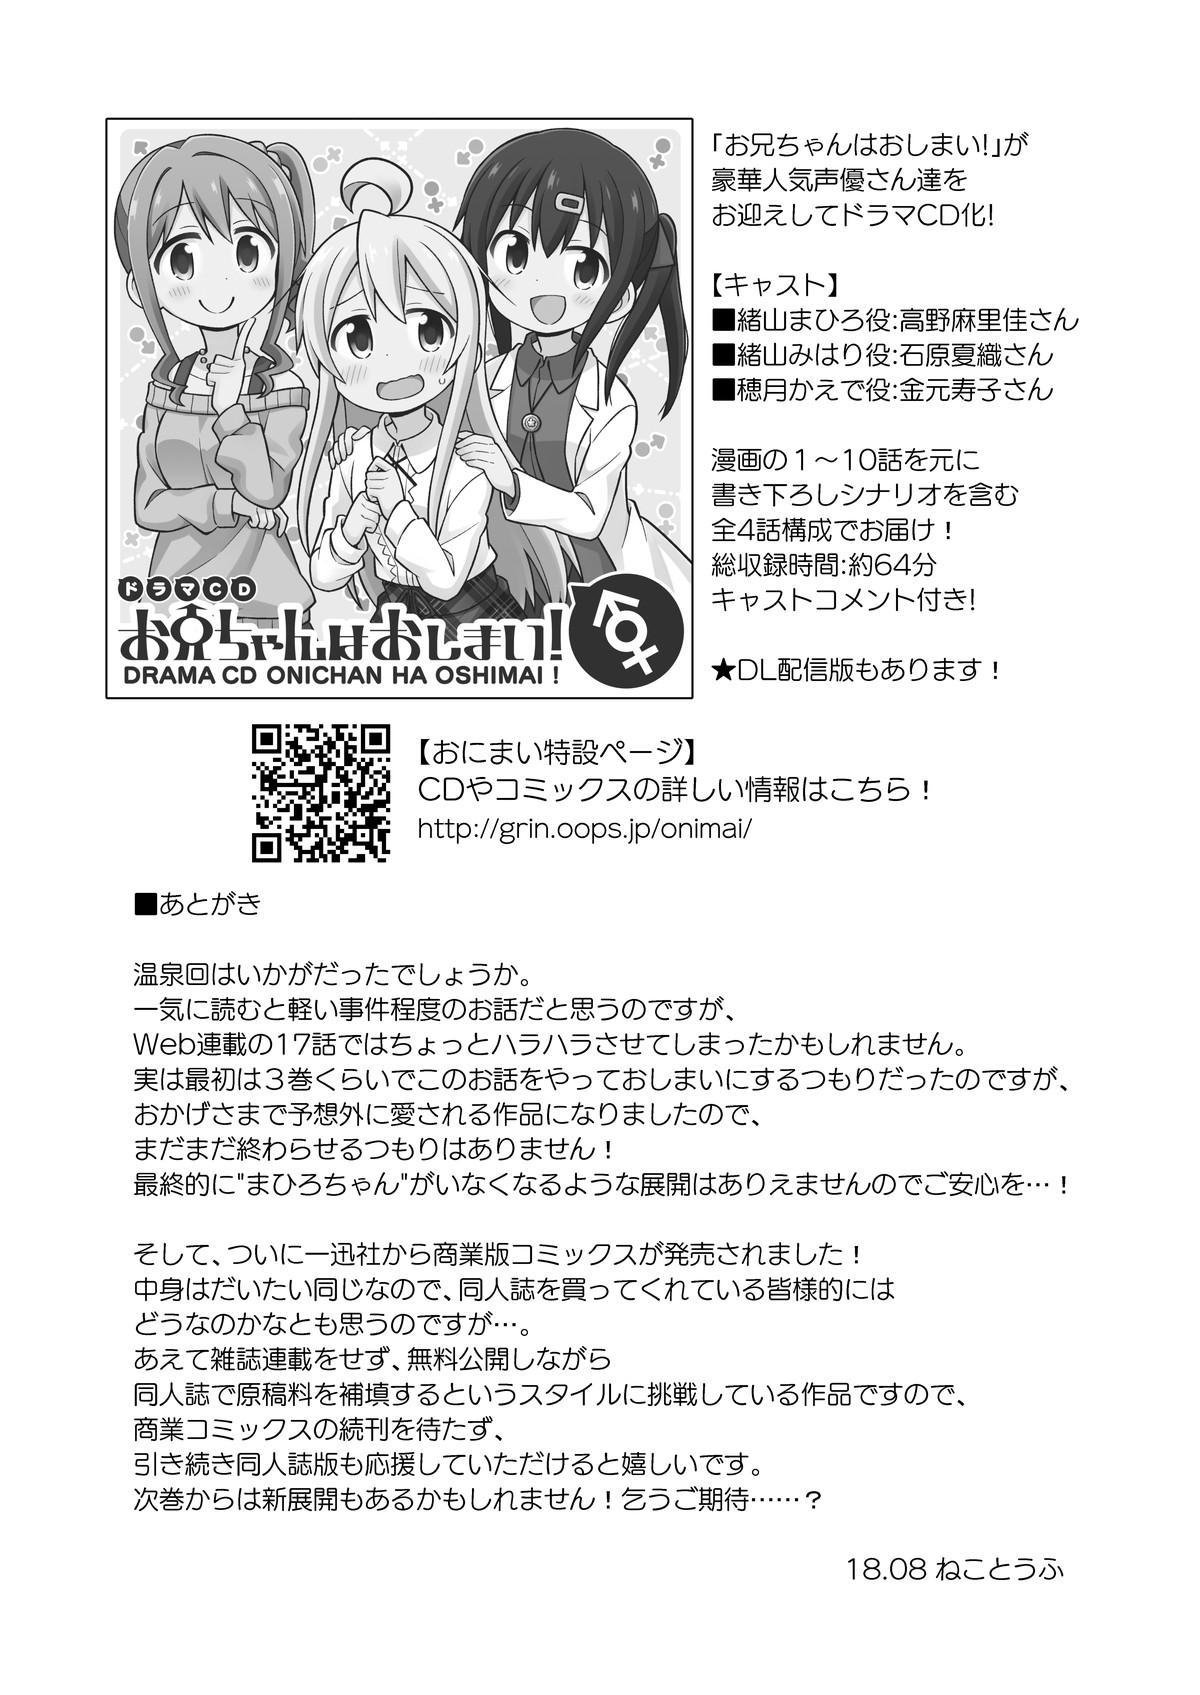 Onii-chan wa Oshimai! 6 47